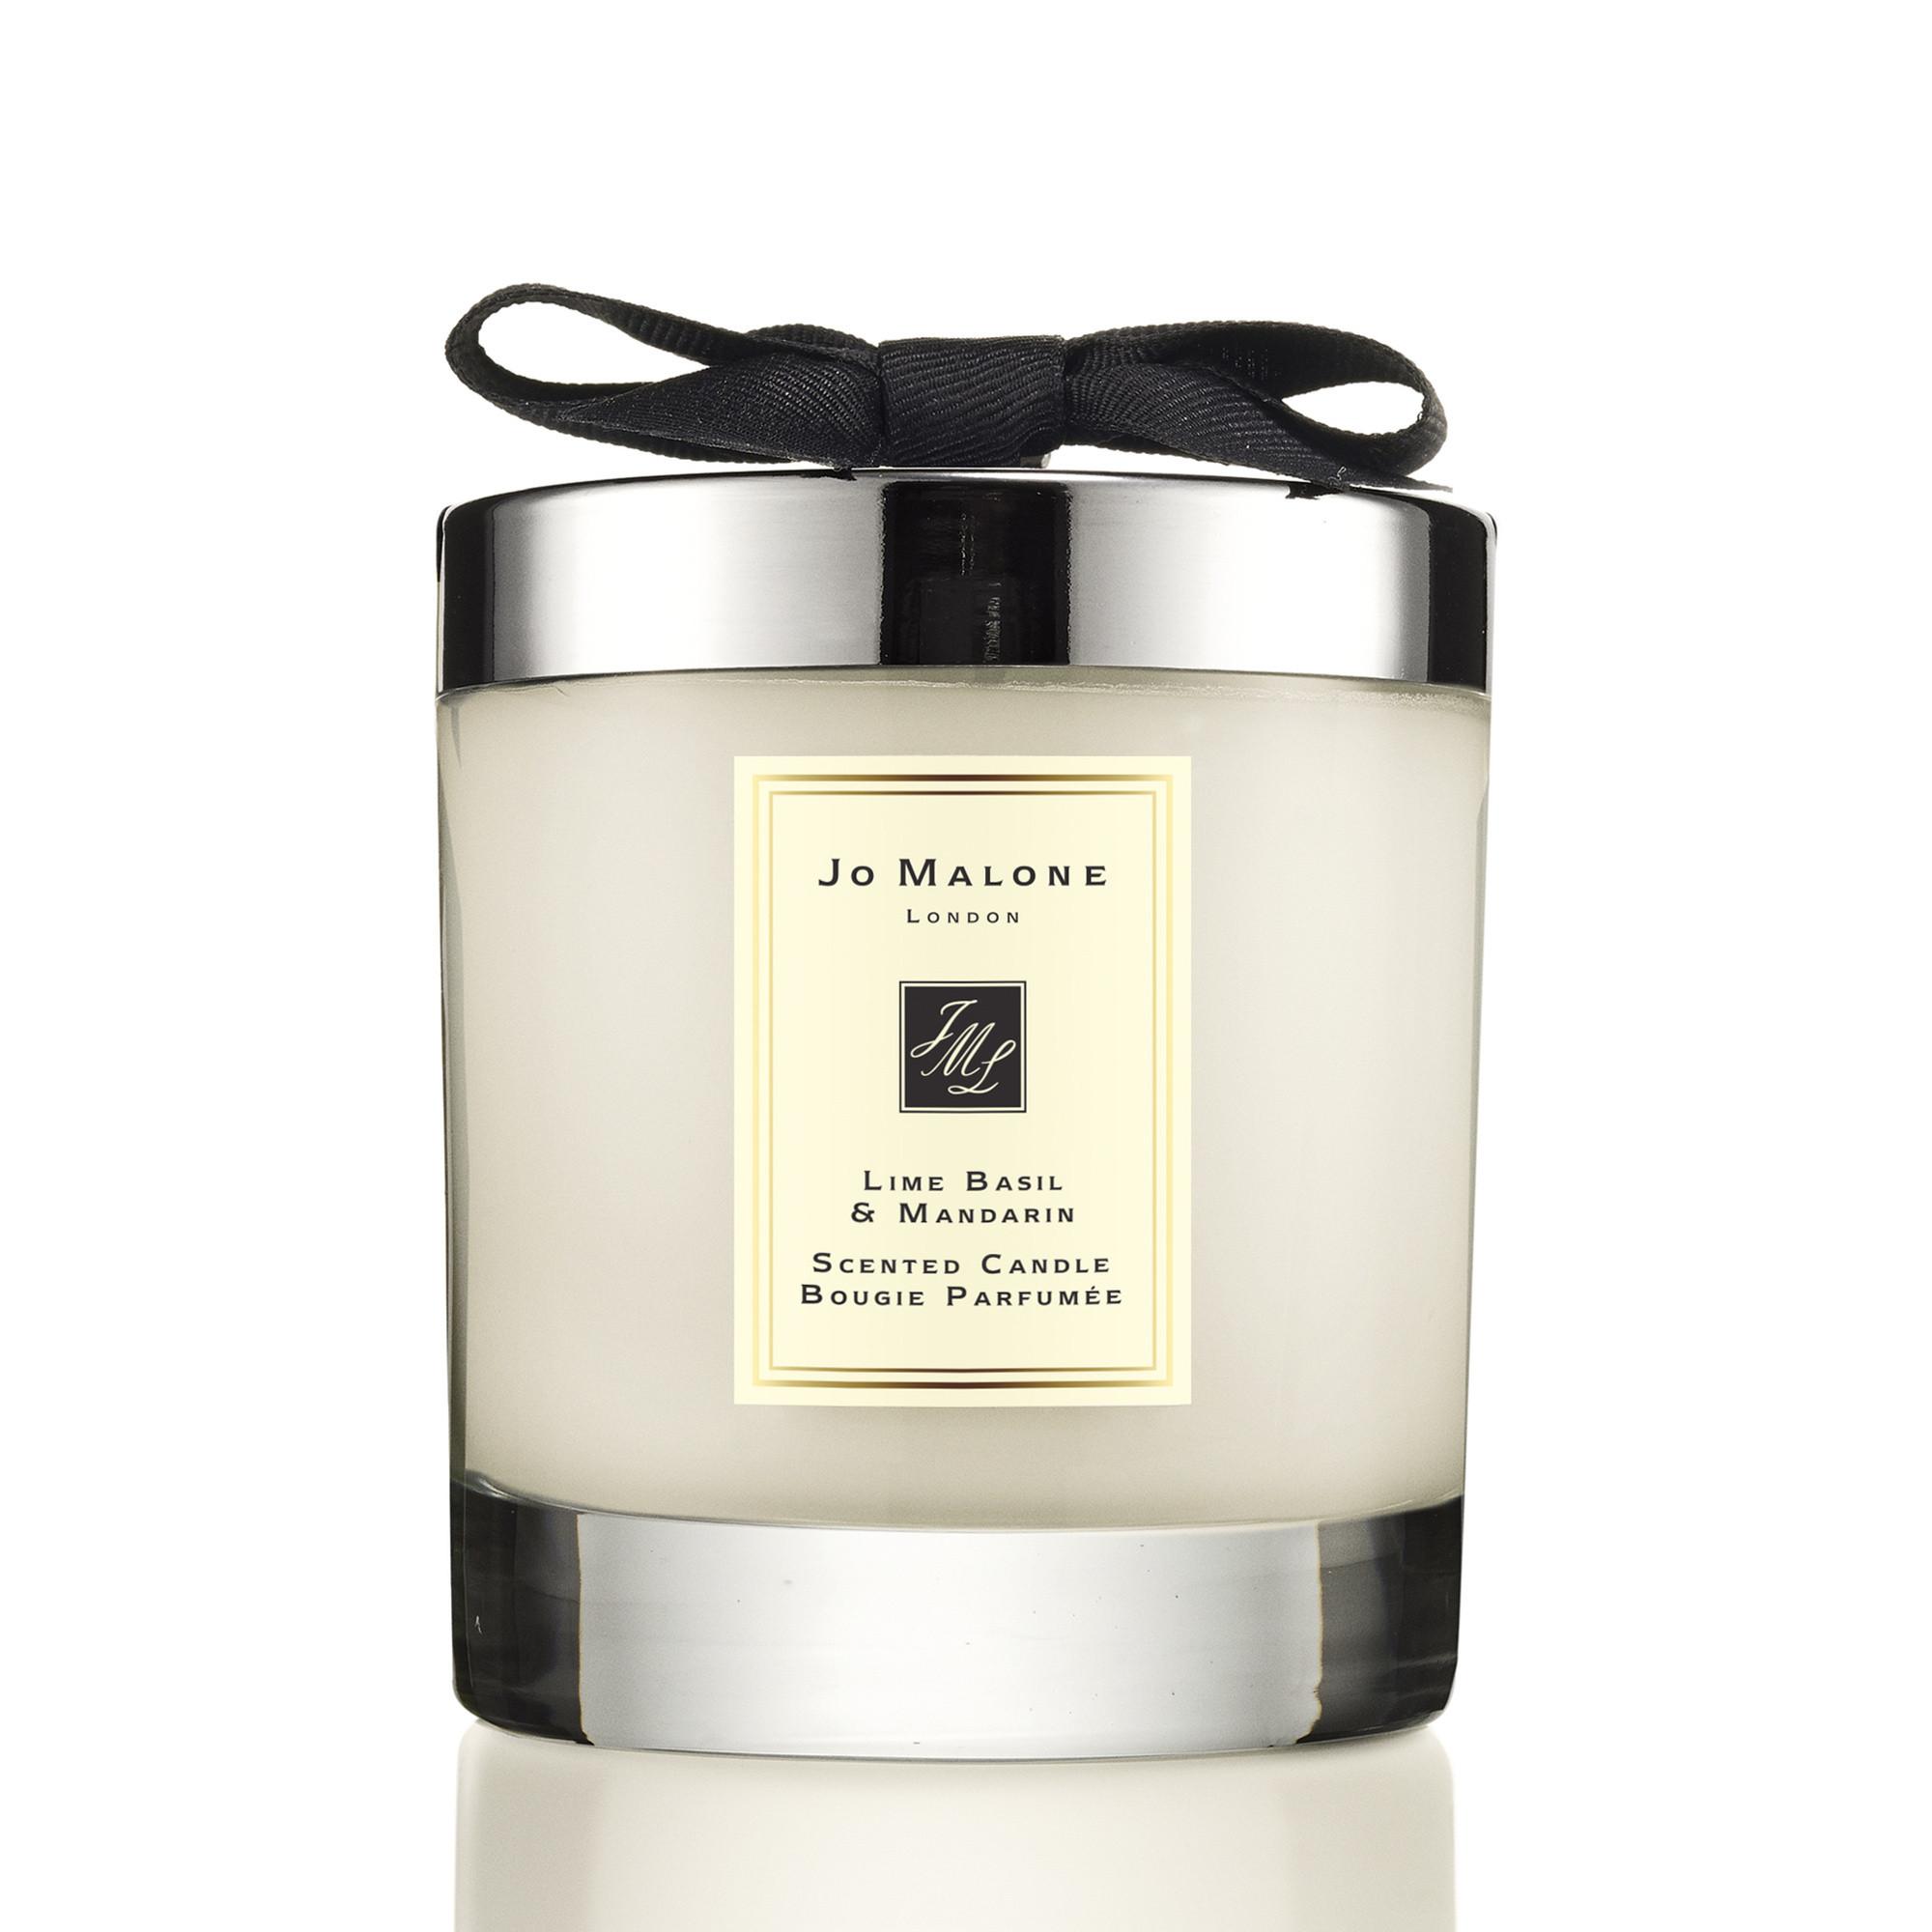 Jo Malone London lime basil & mandarin home candle 200 g, Nero, large image number 0